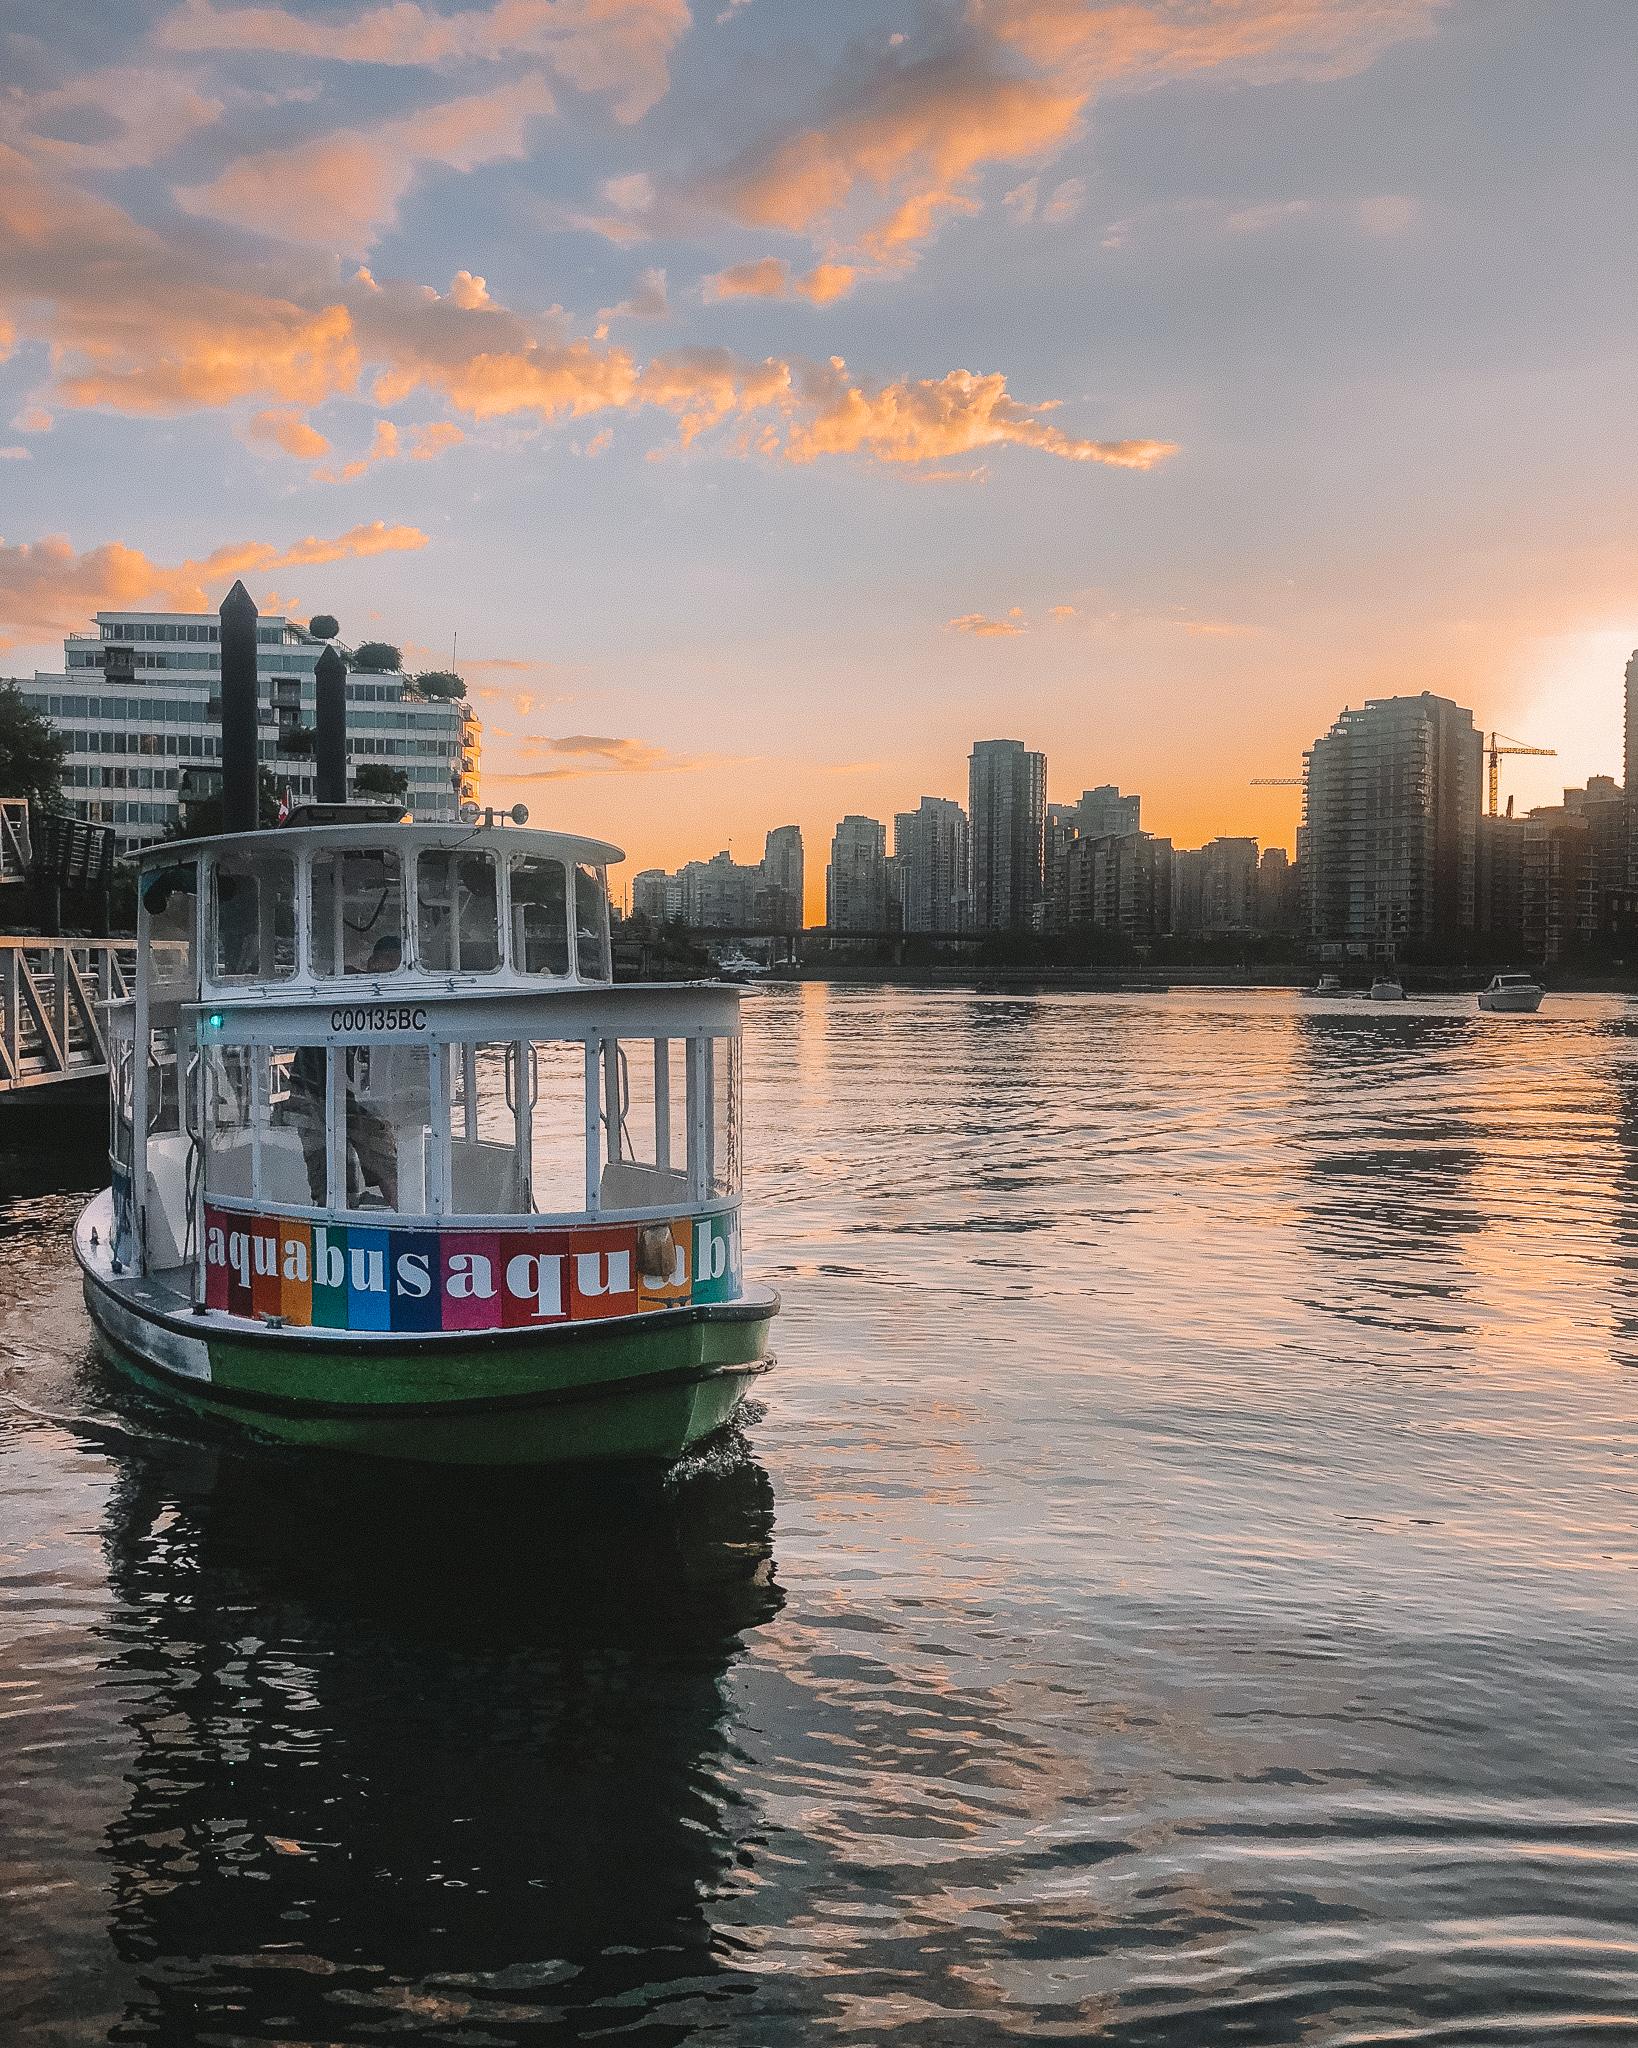 Vancouver Aquabus at sunset